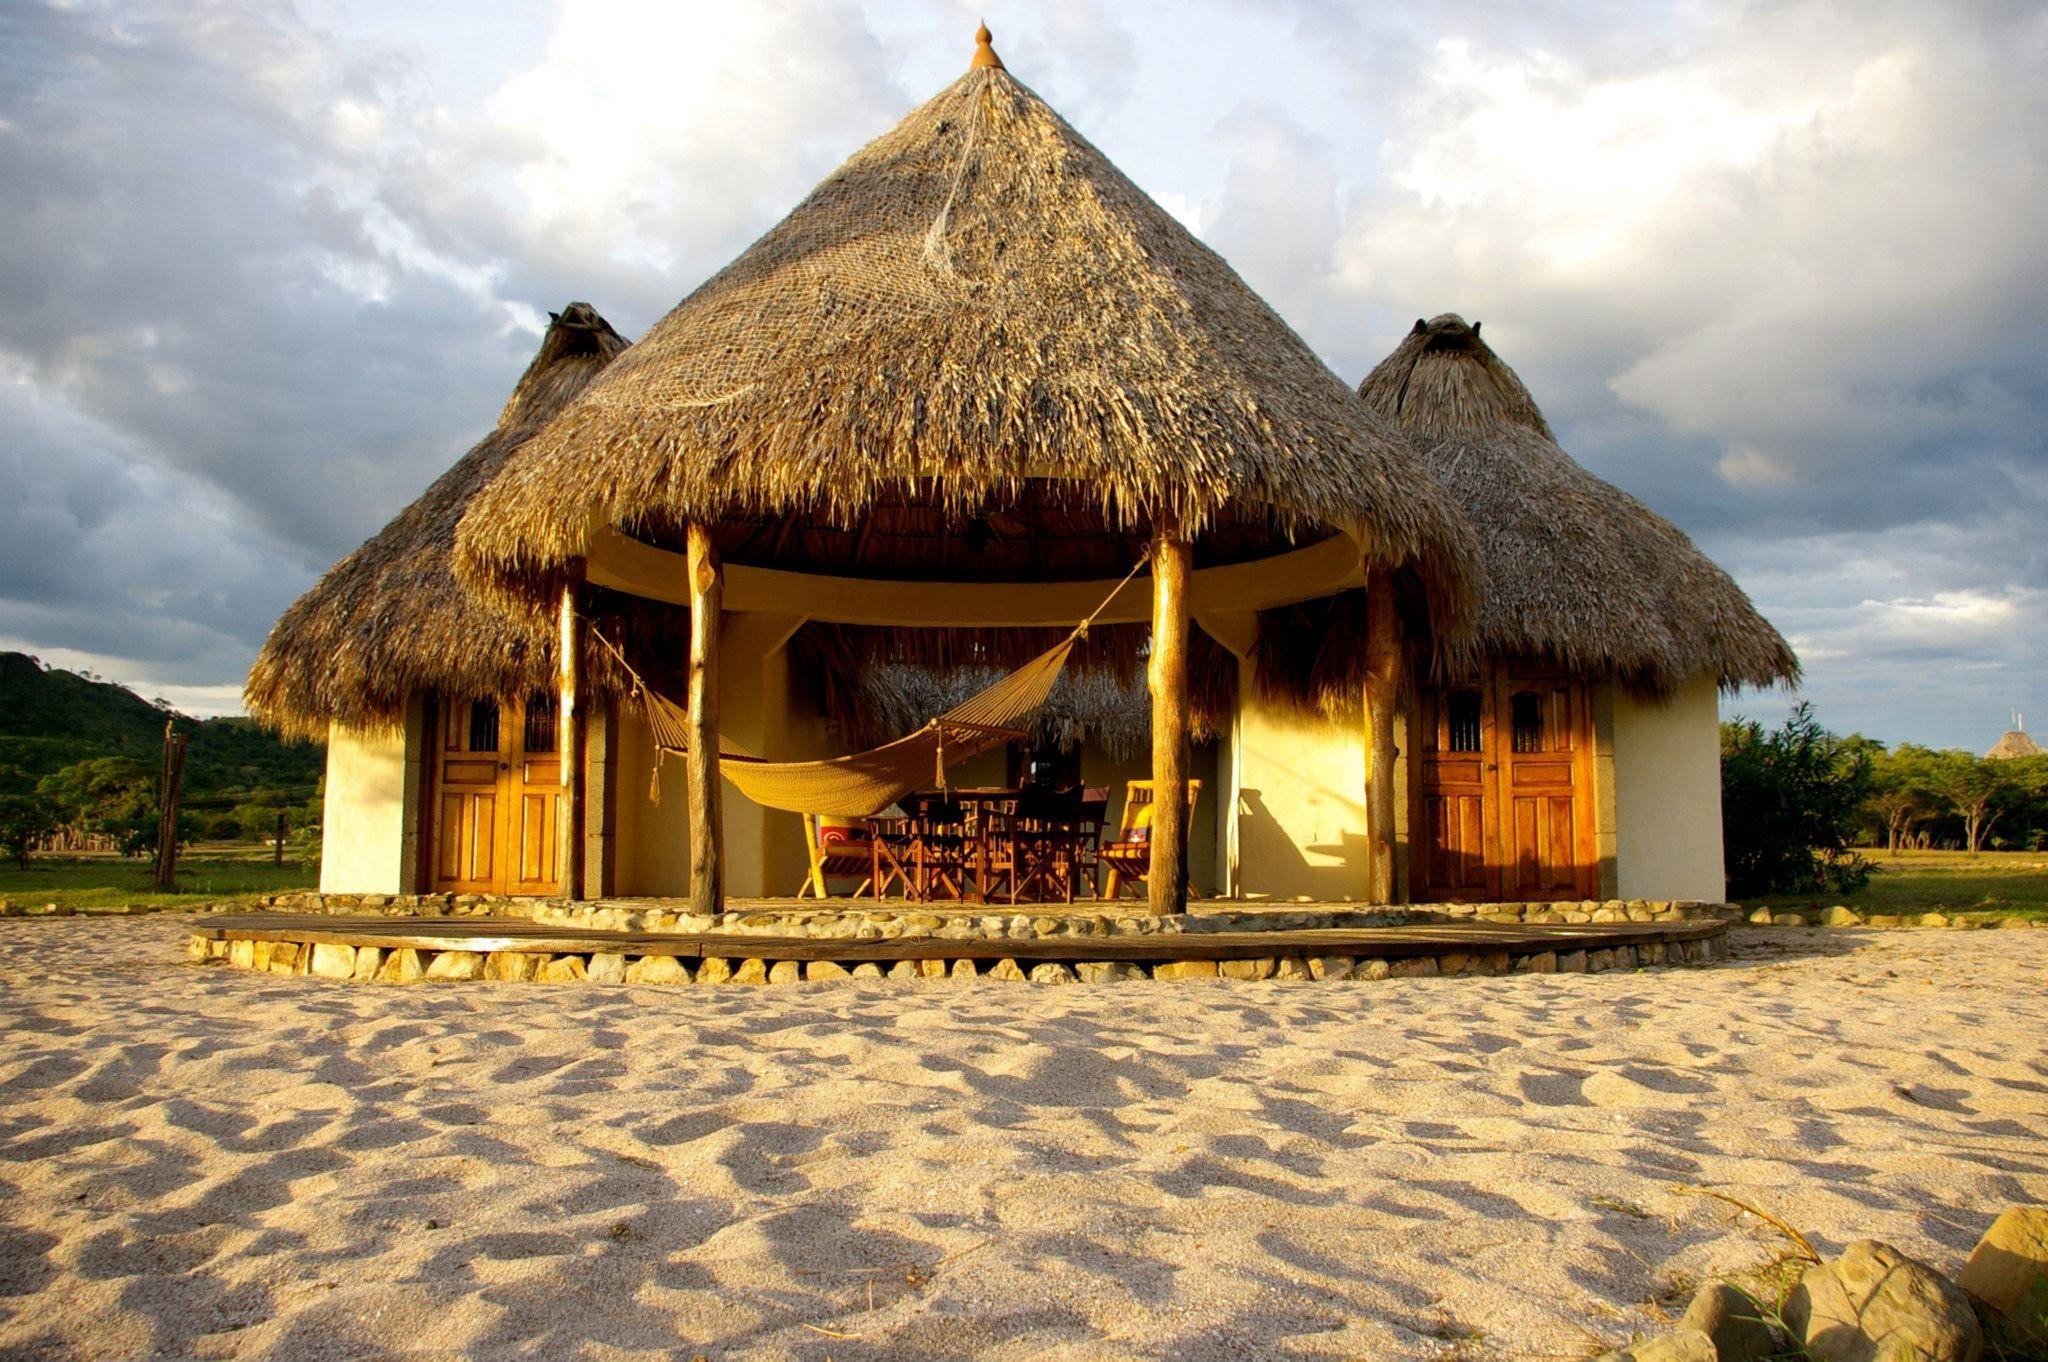 Surf and Turtle Resort Punta Teonoste - www.roatan.com 1-800-282-8932